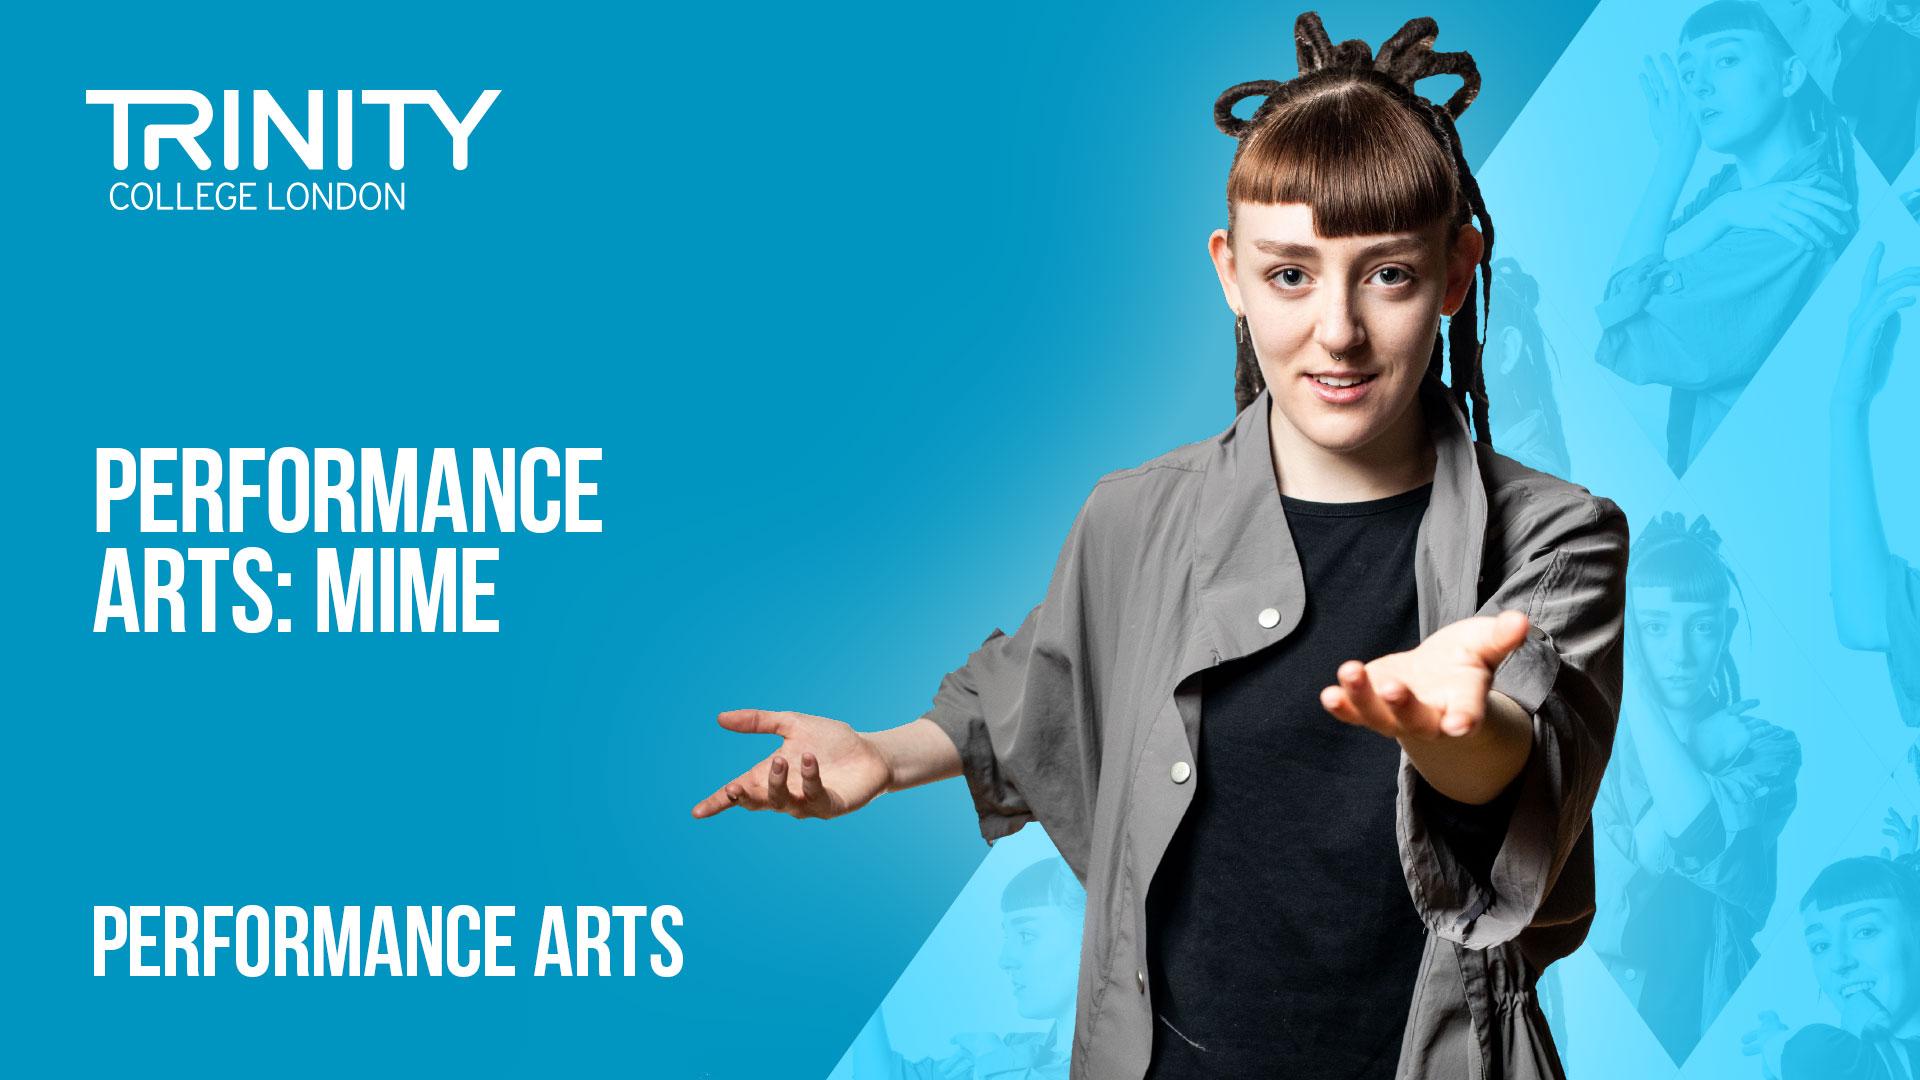 4-Performance Arts- mime-V2